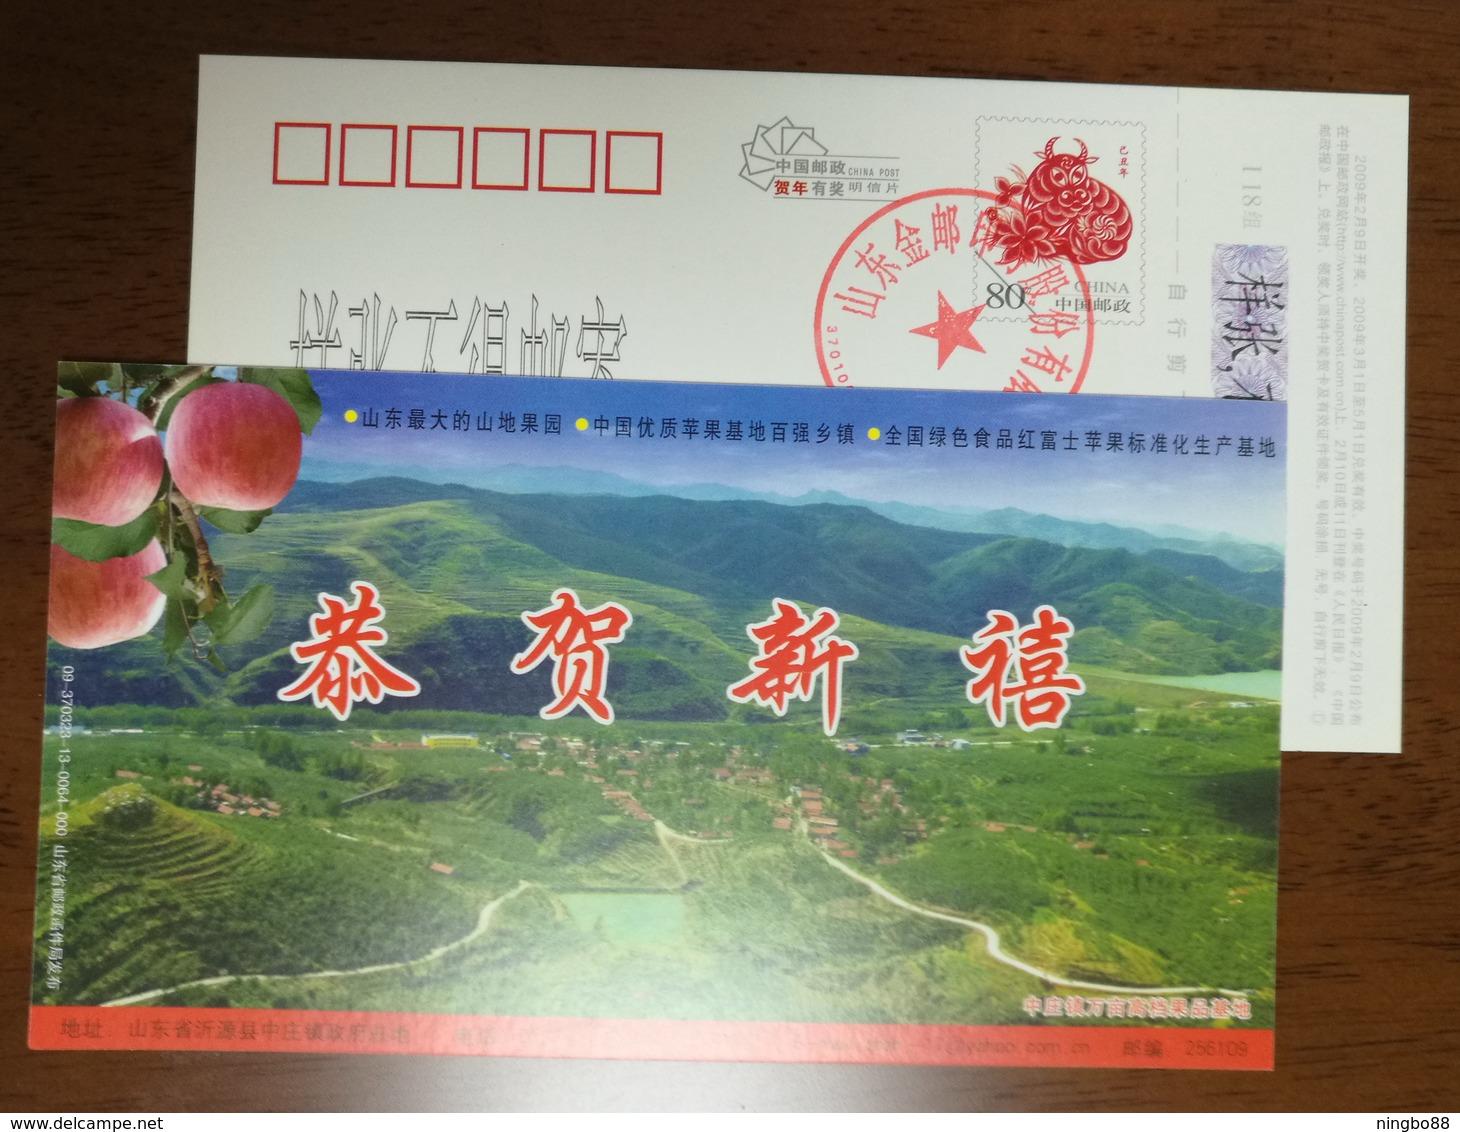 Red Fuji Apple,CN09 Zhongzhuang Town Ten Thousands Mu High Quality Fruit Base Pre-stamped Card,specimen Overprinted - Frutas